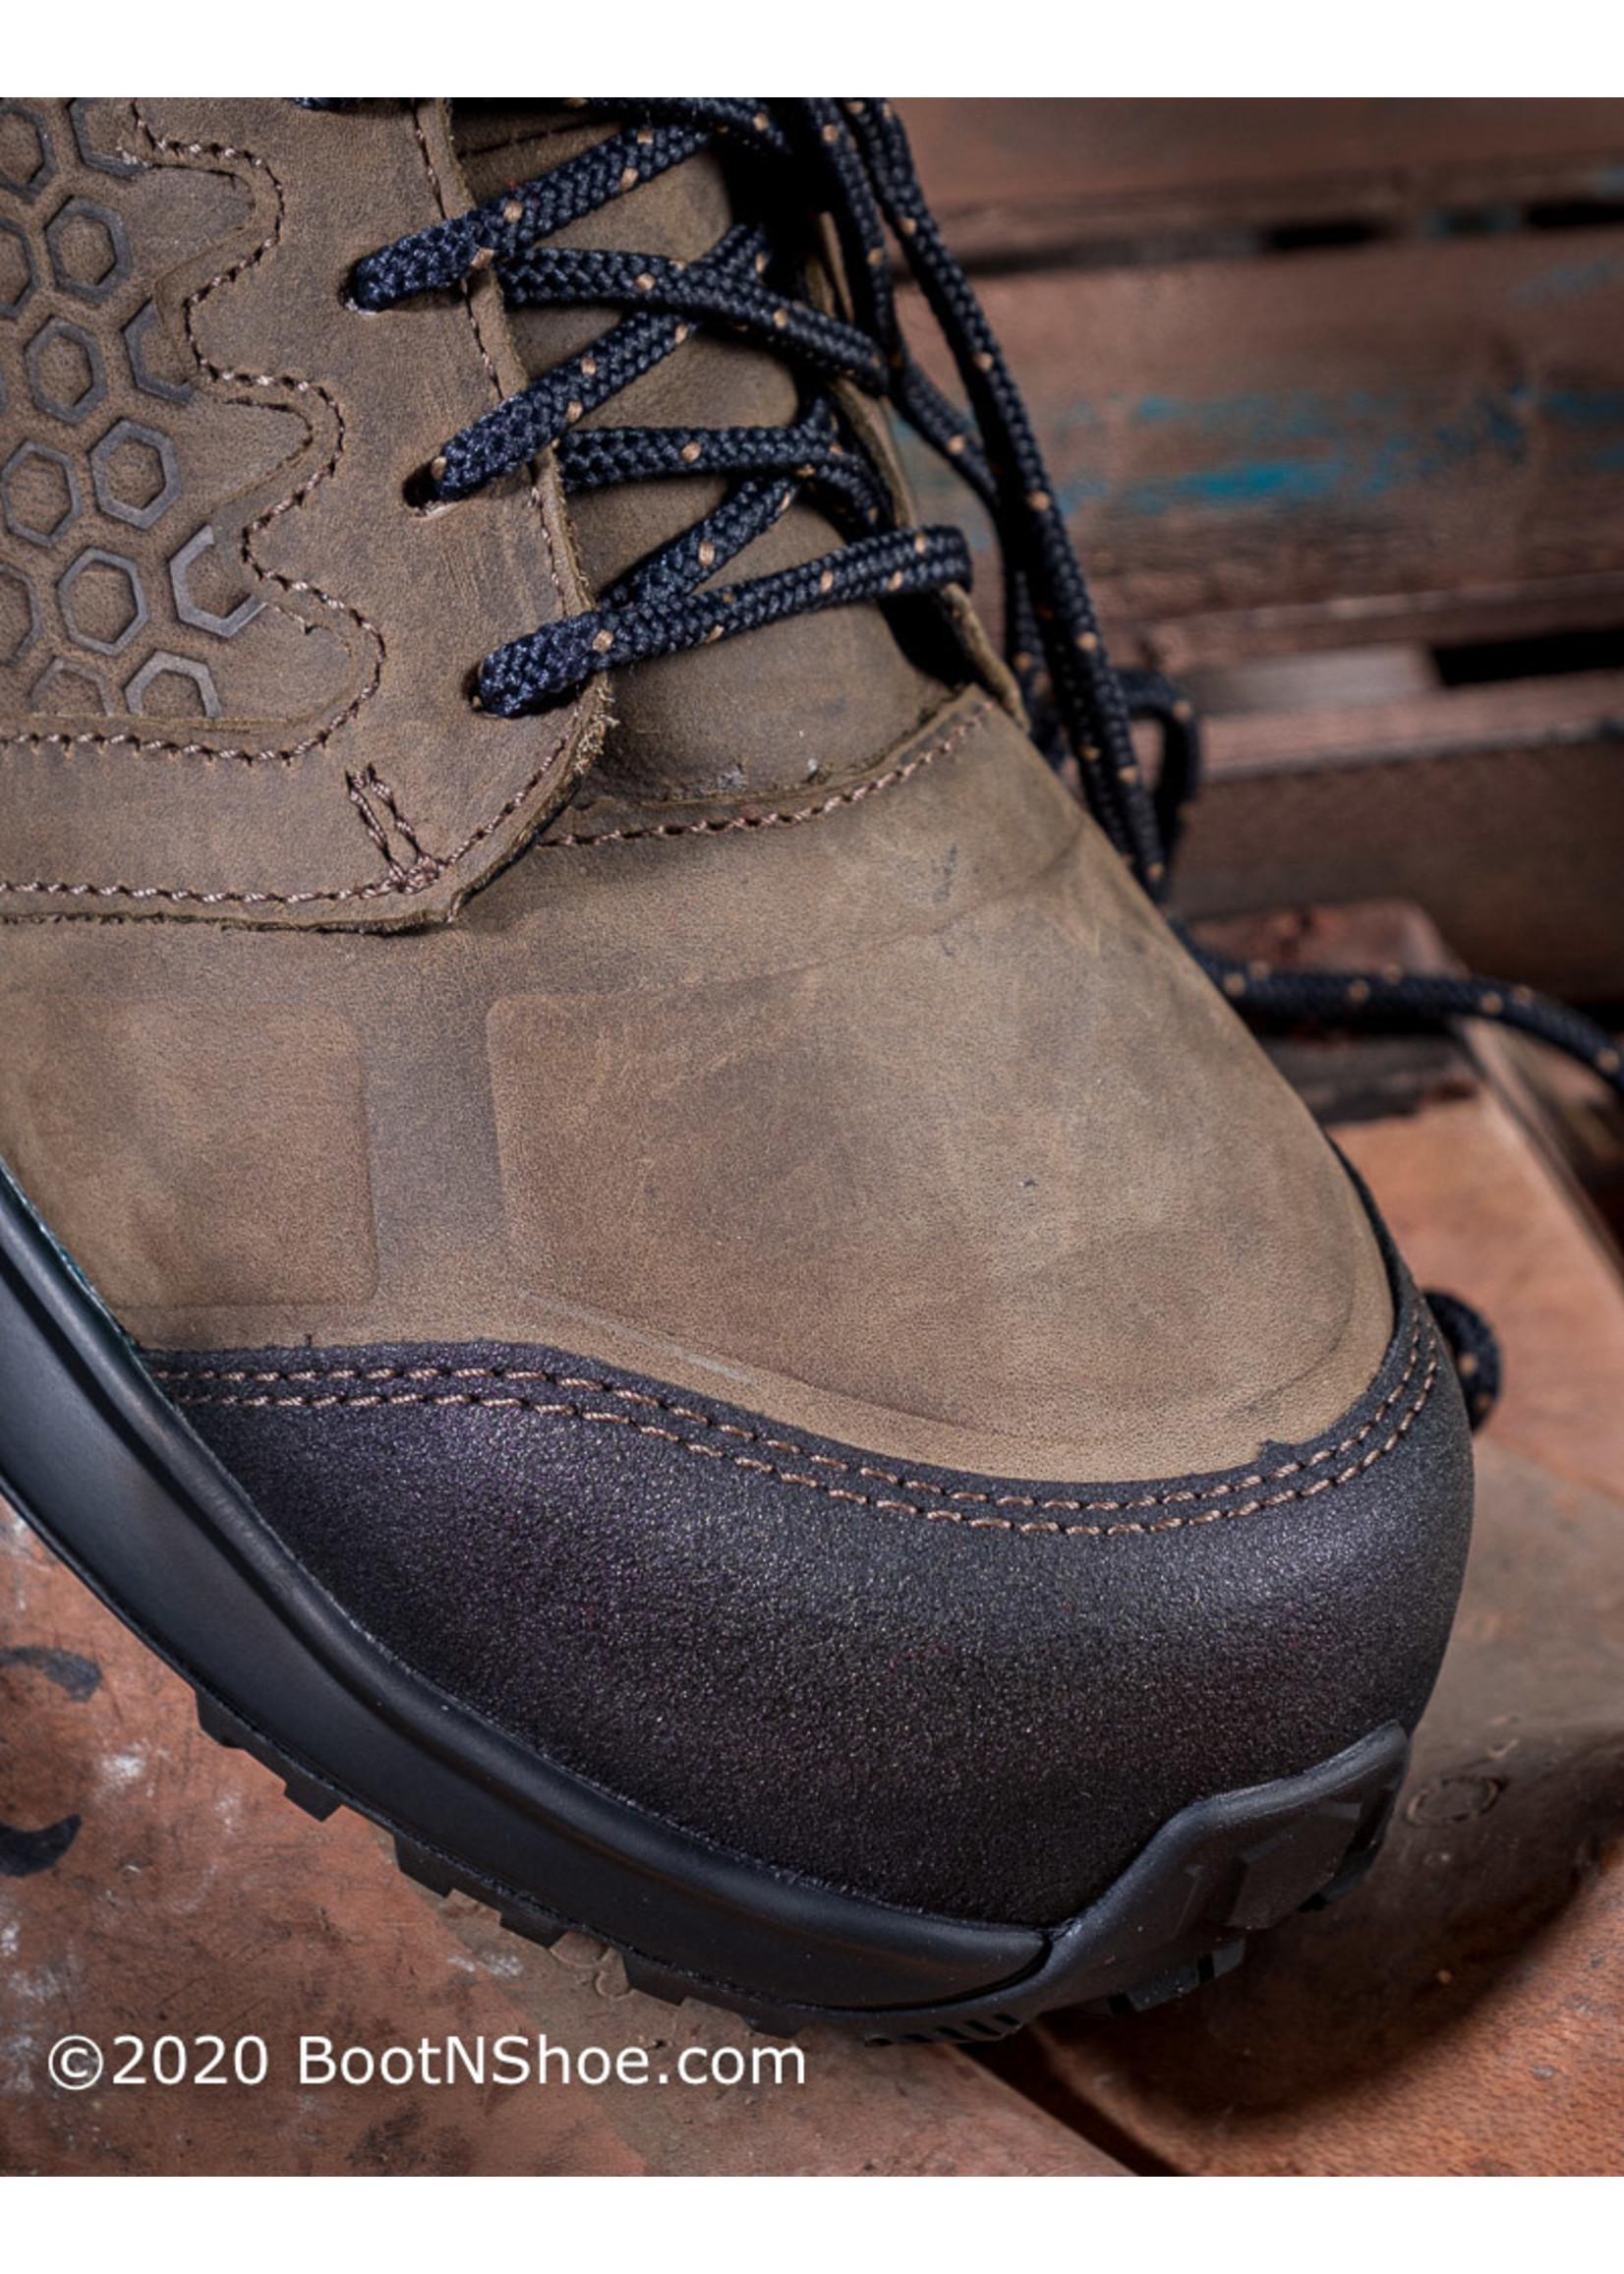 Timberland Pro Women's Purple Reaxion Comp Toe Waterproof Work Boot A219B